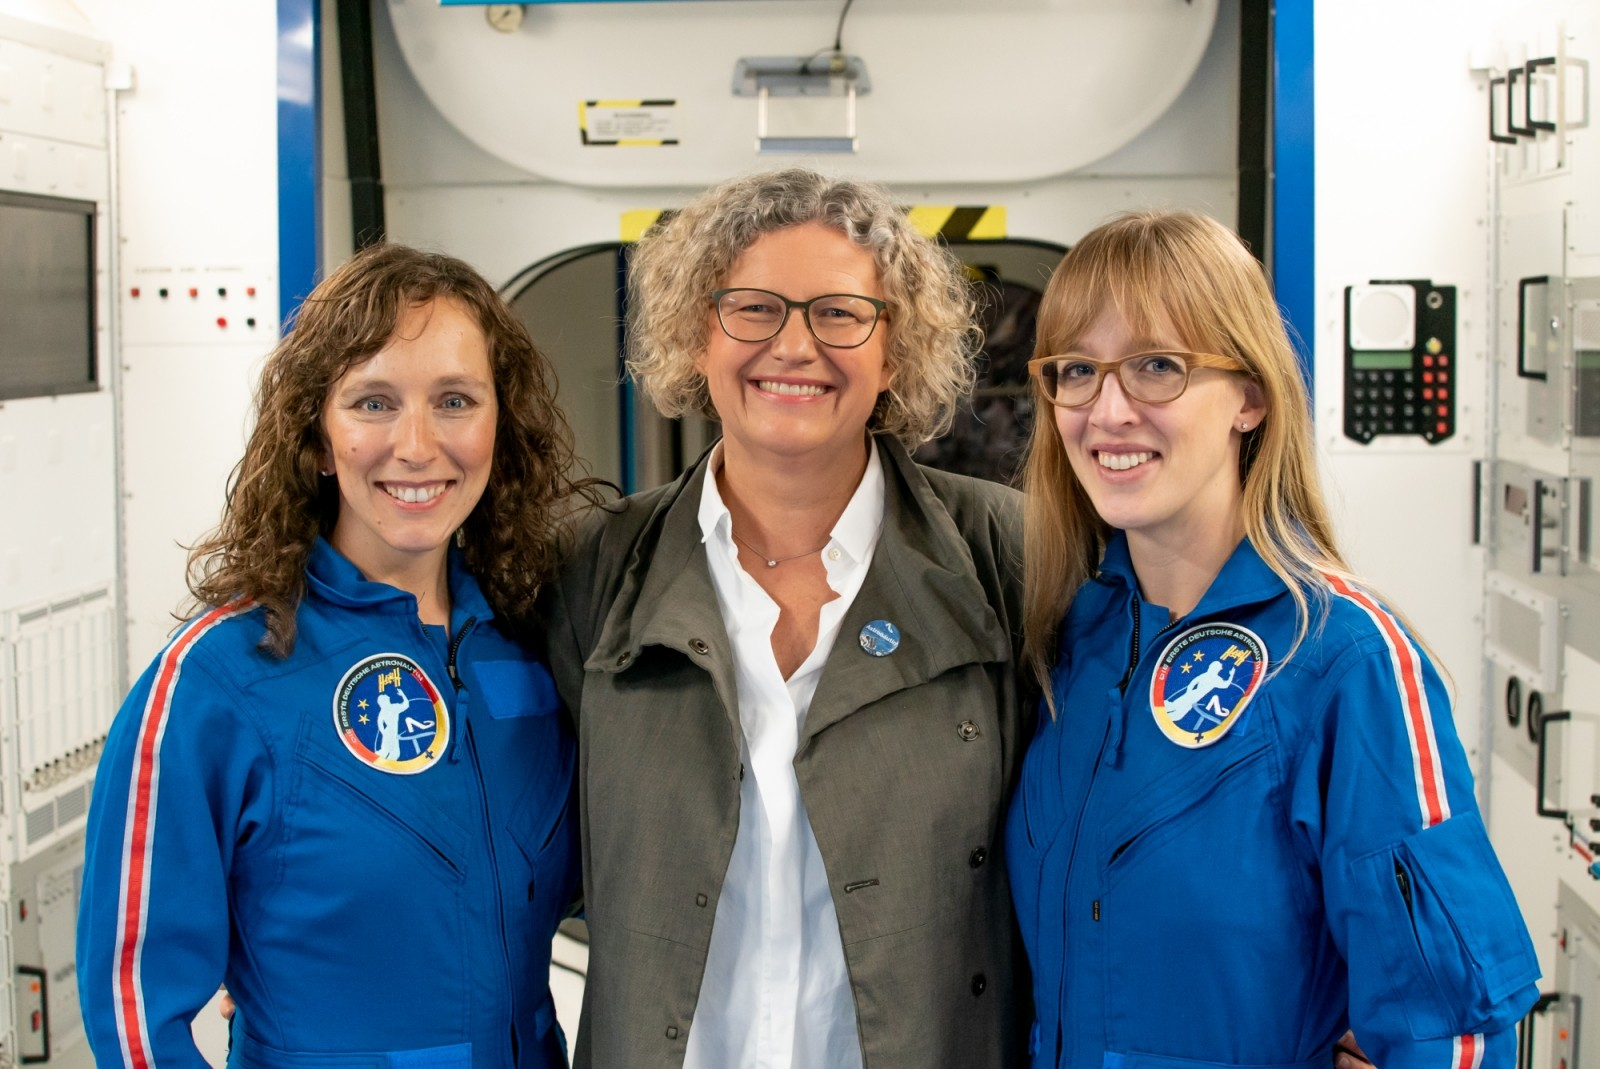 Unsere Polarsternpreisträgerin 2019, Claudia Kessler, im Interview